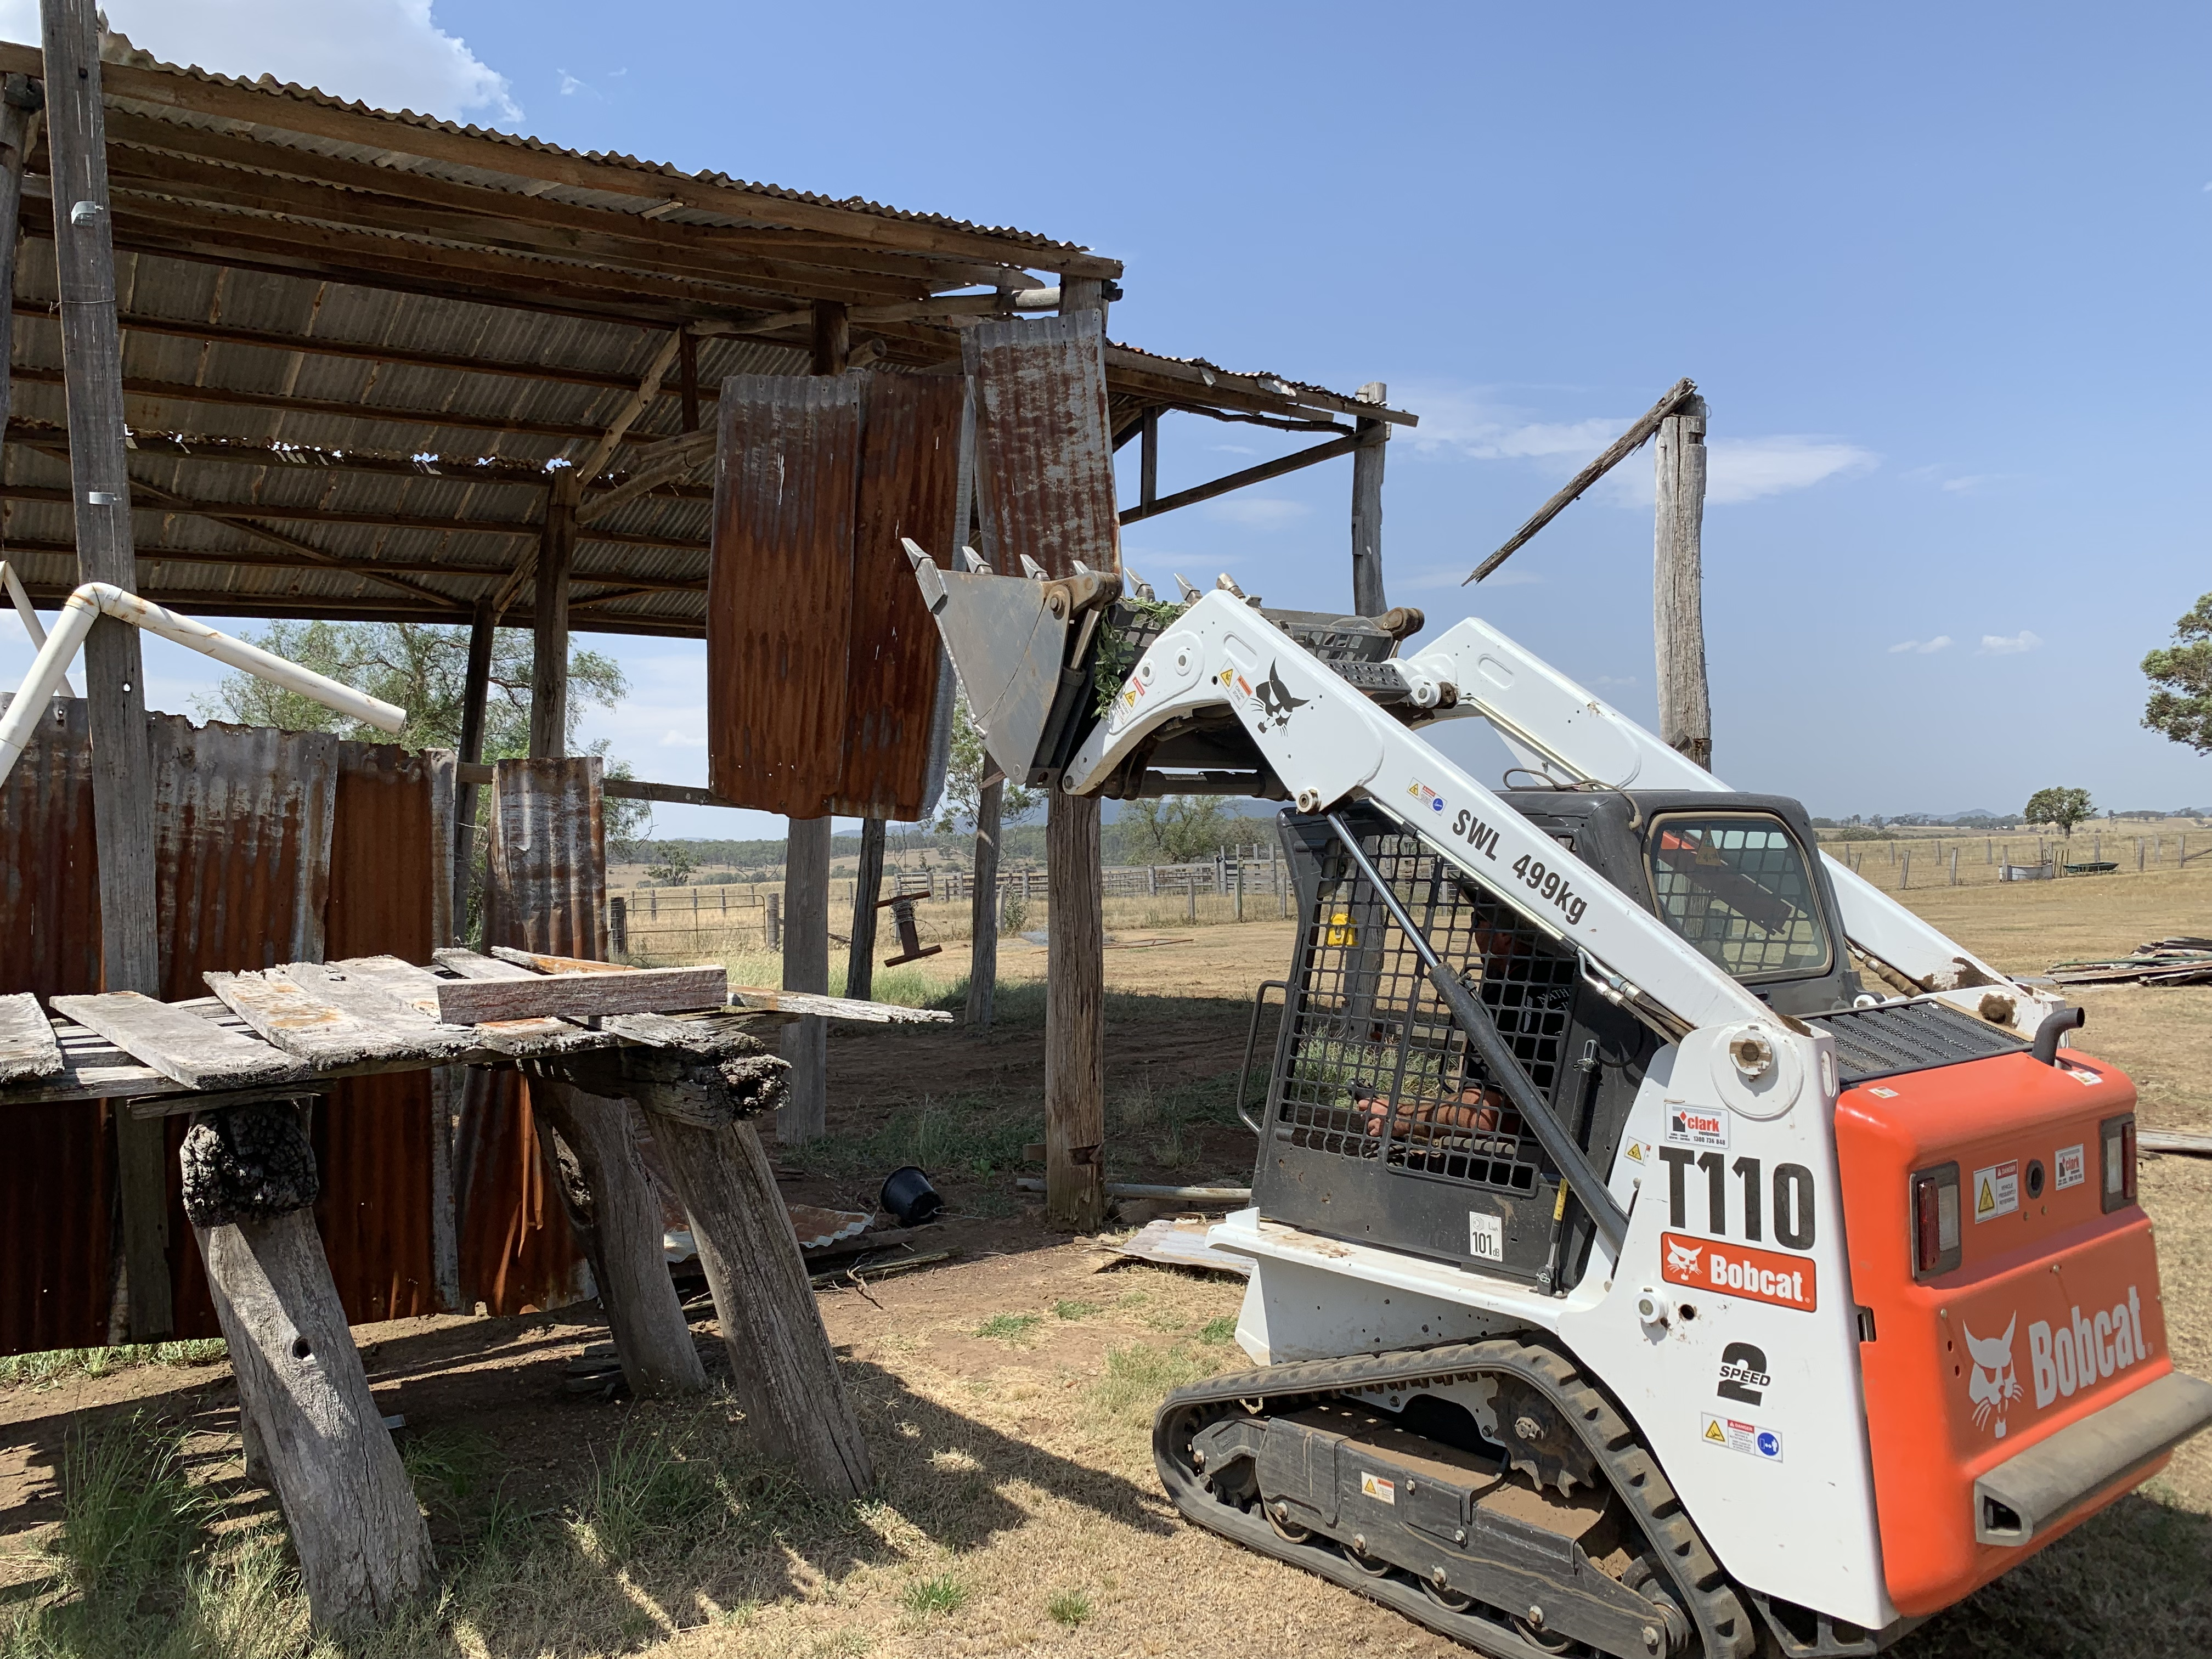 Demolition of an old shed